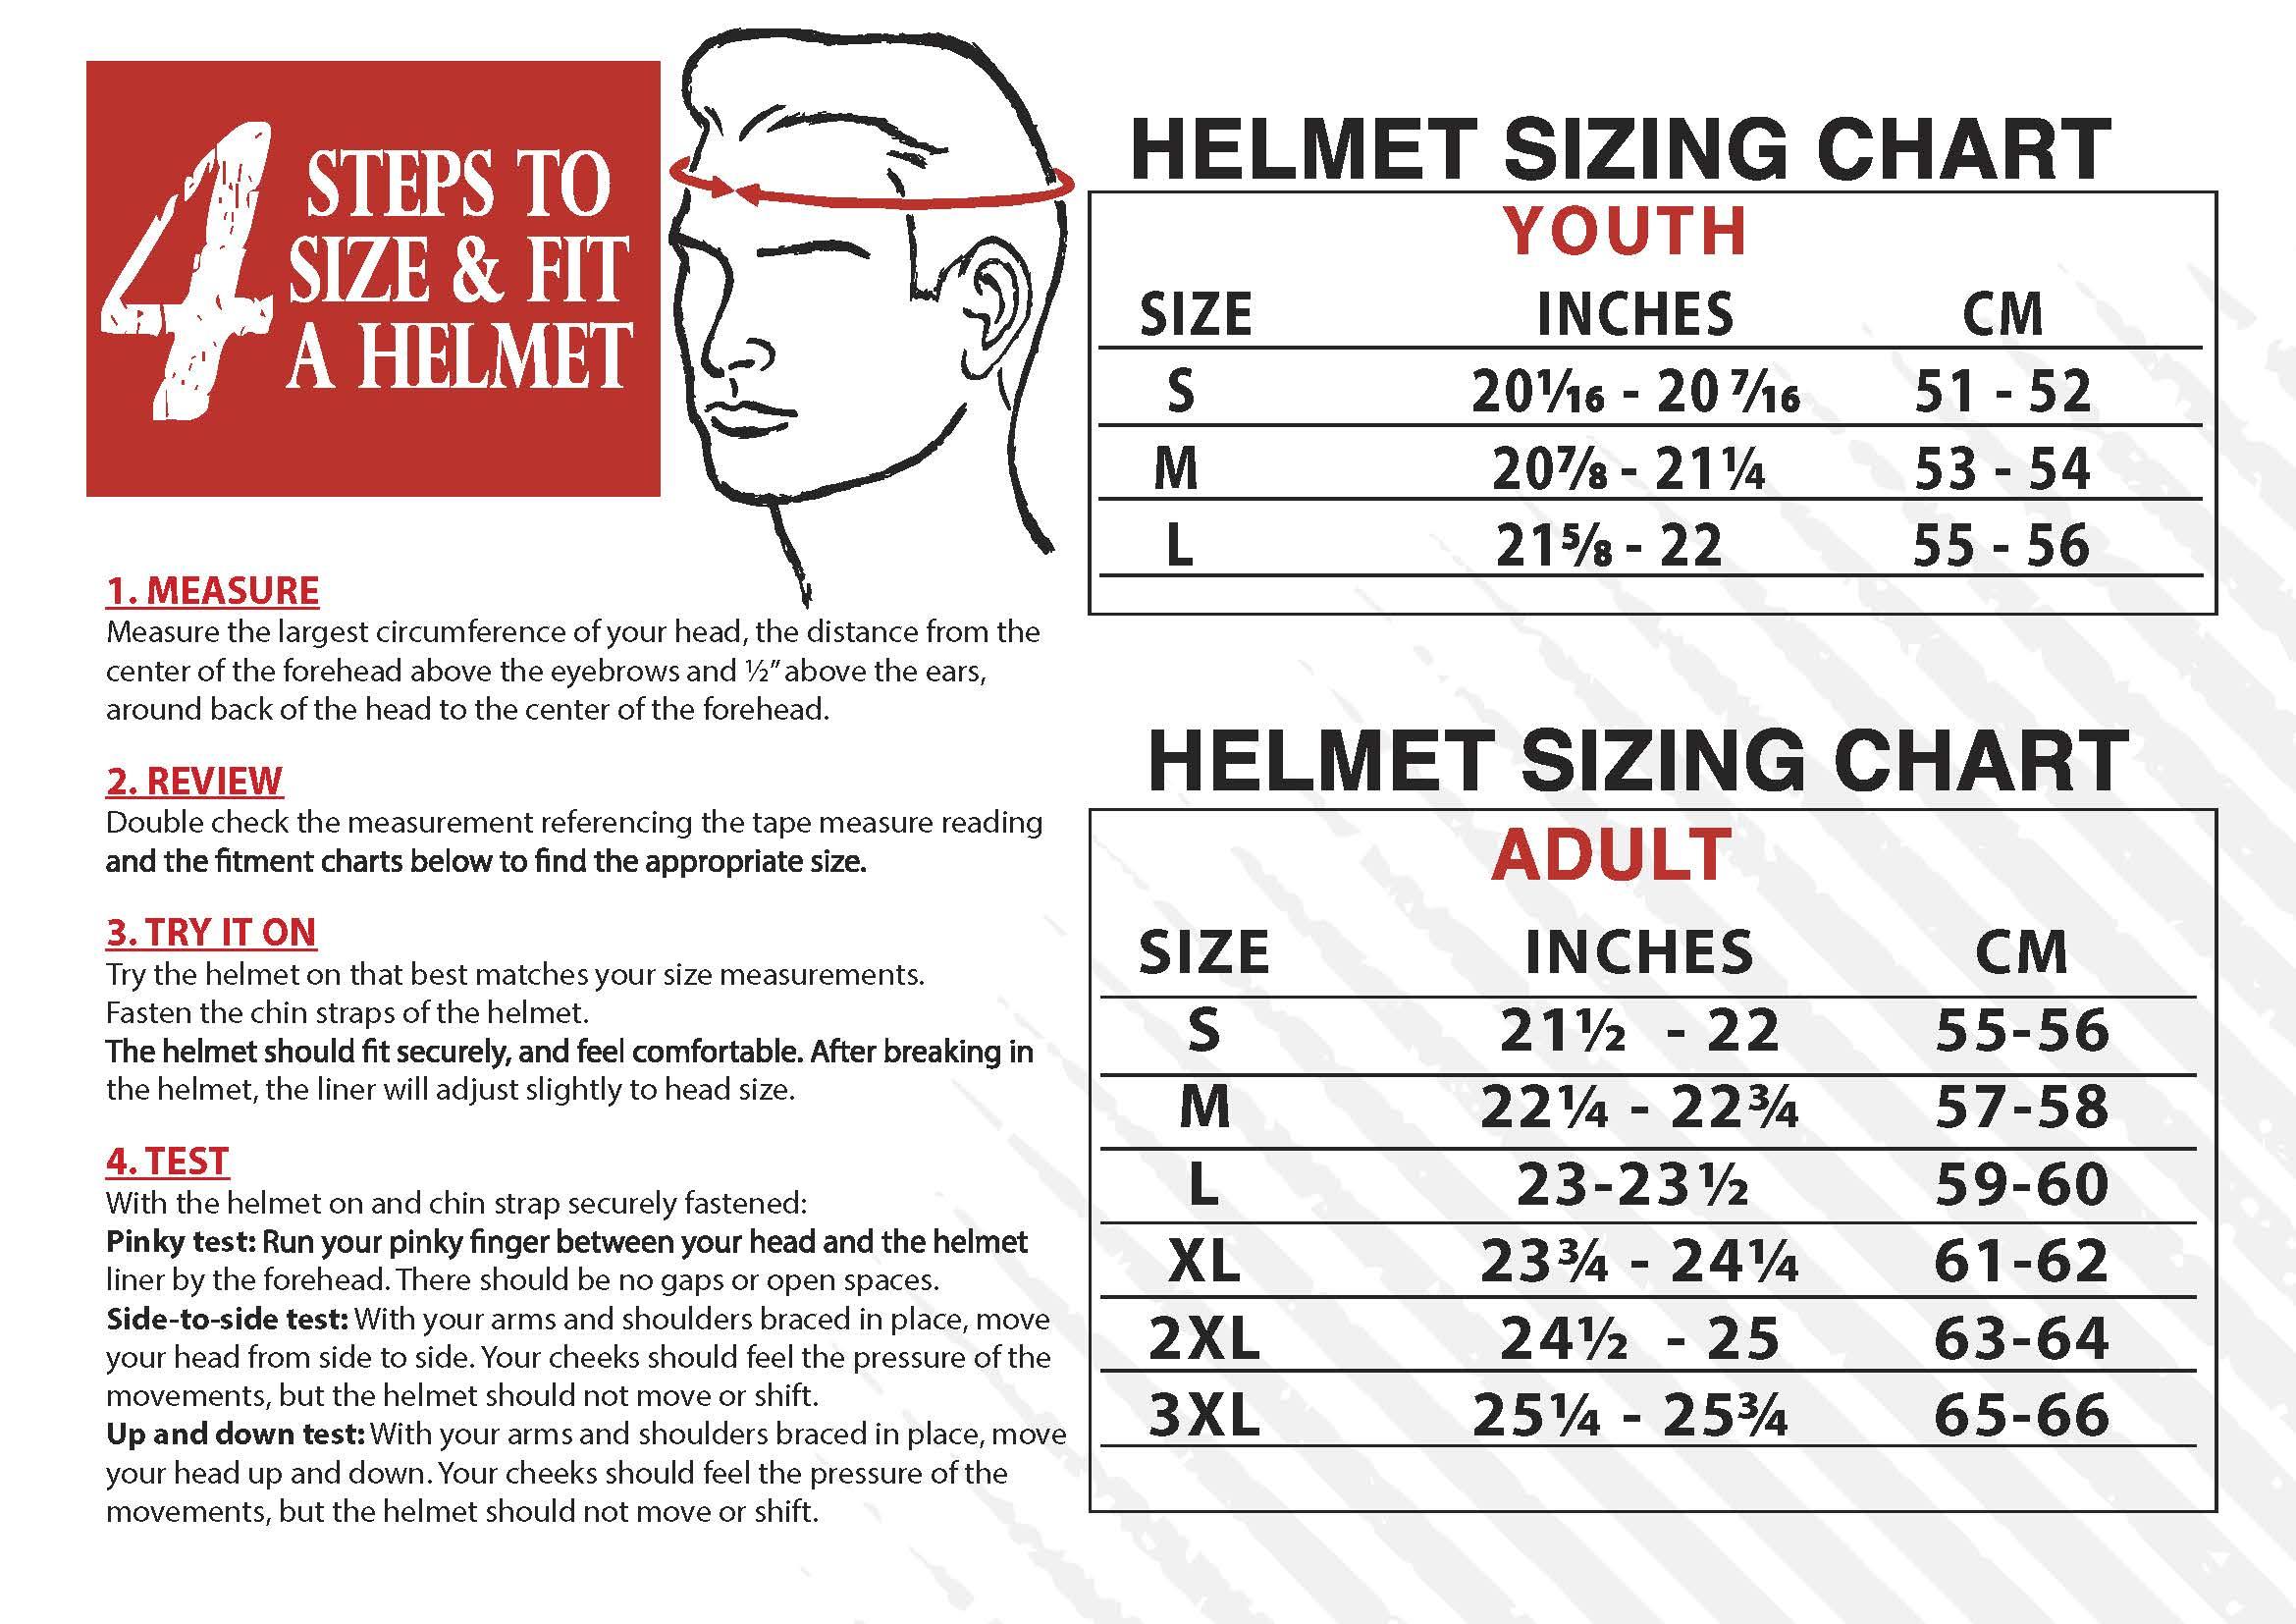 Helmet Fitting/Size Chart